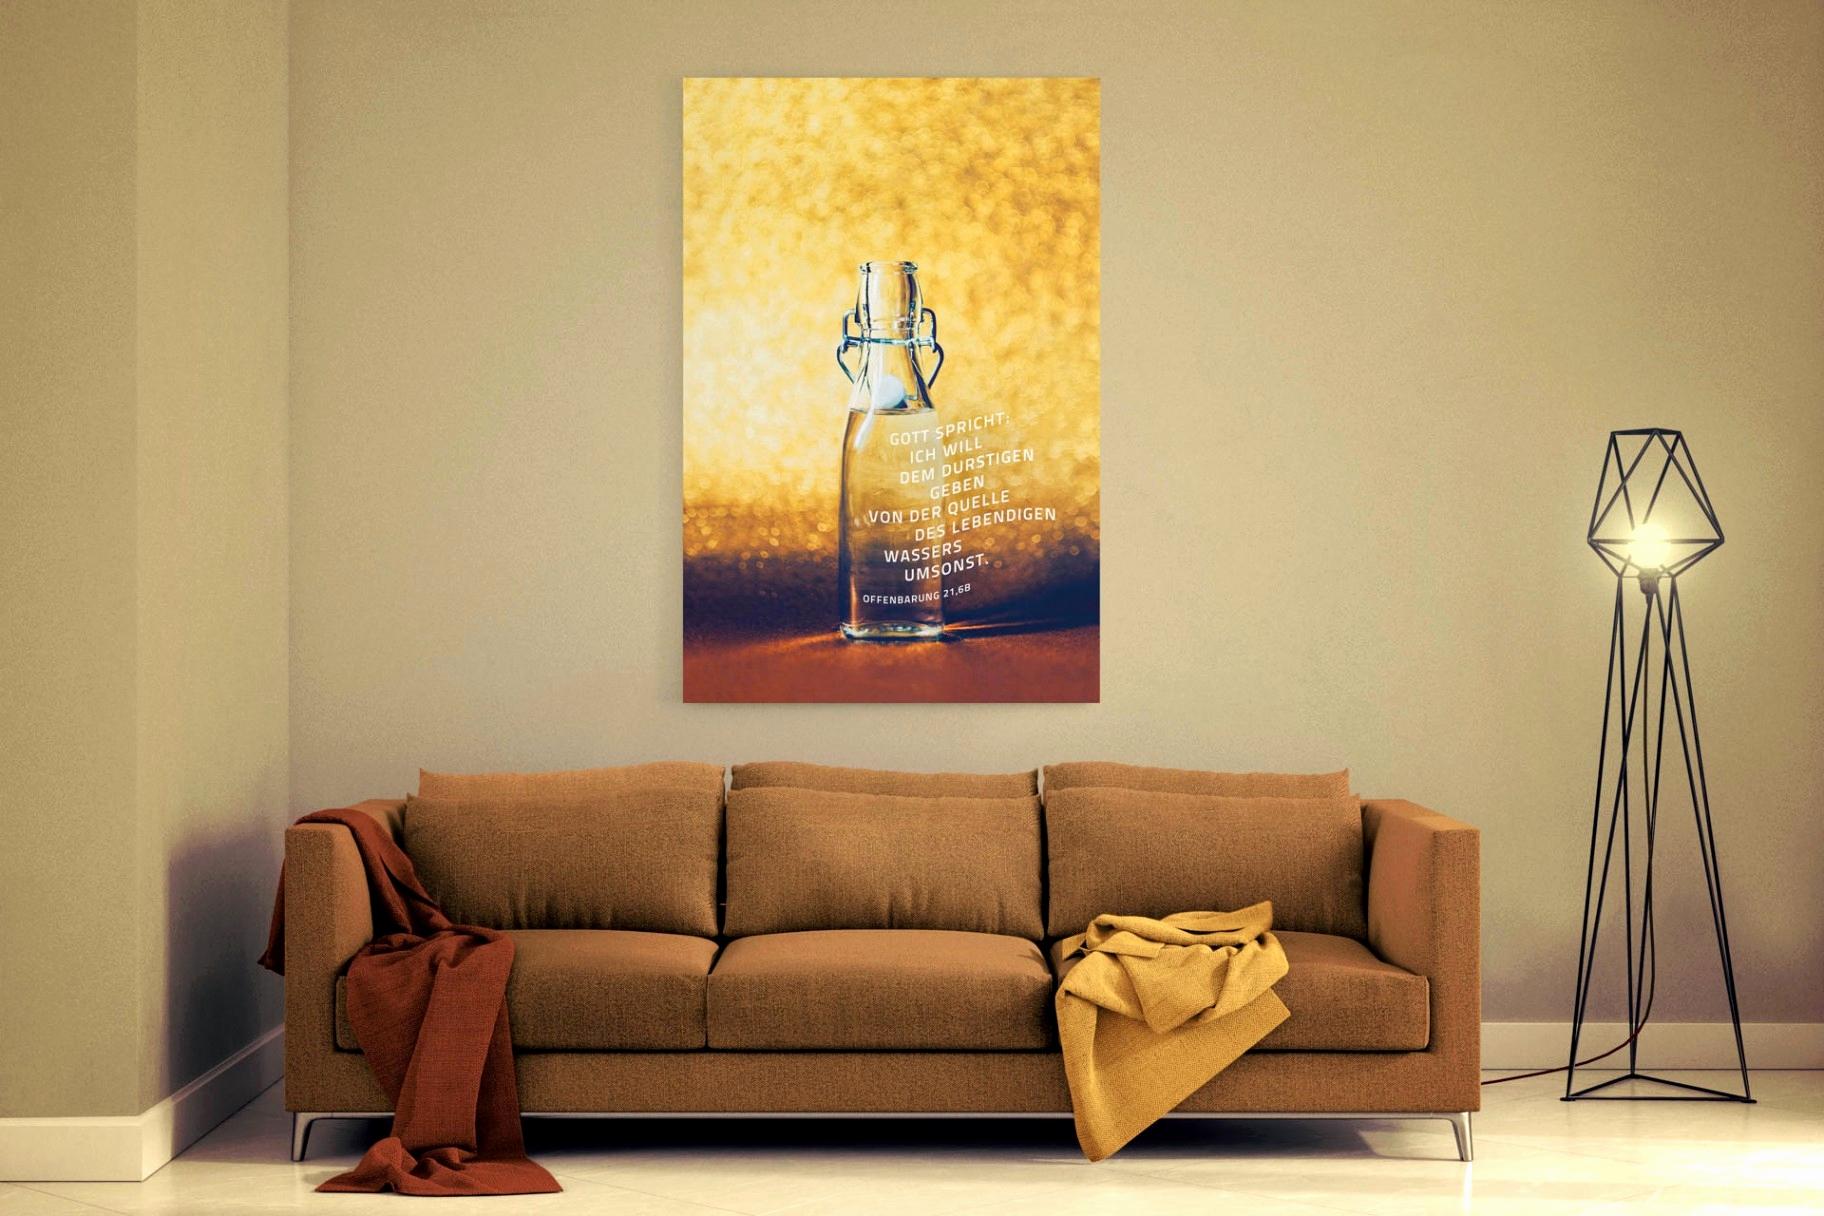 Full Size of Coole Wandbilder Wohnzimmer Xxxl Sofa Board Deckenlampe Schrank Küche Modern Weiss Hängeschrank Bilder Liege Beleuchtung Tapete Stehlampe Led Lampen Xxl Grau Wohnzimmer Wandbilder Wohnzimmer Modern Xxl